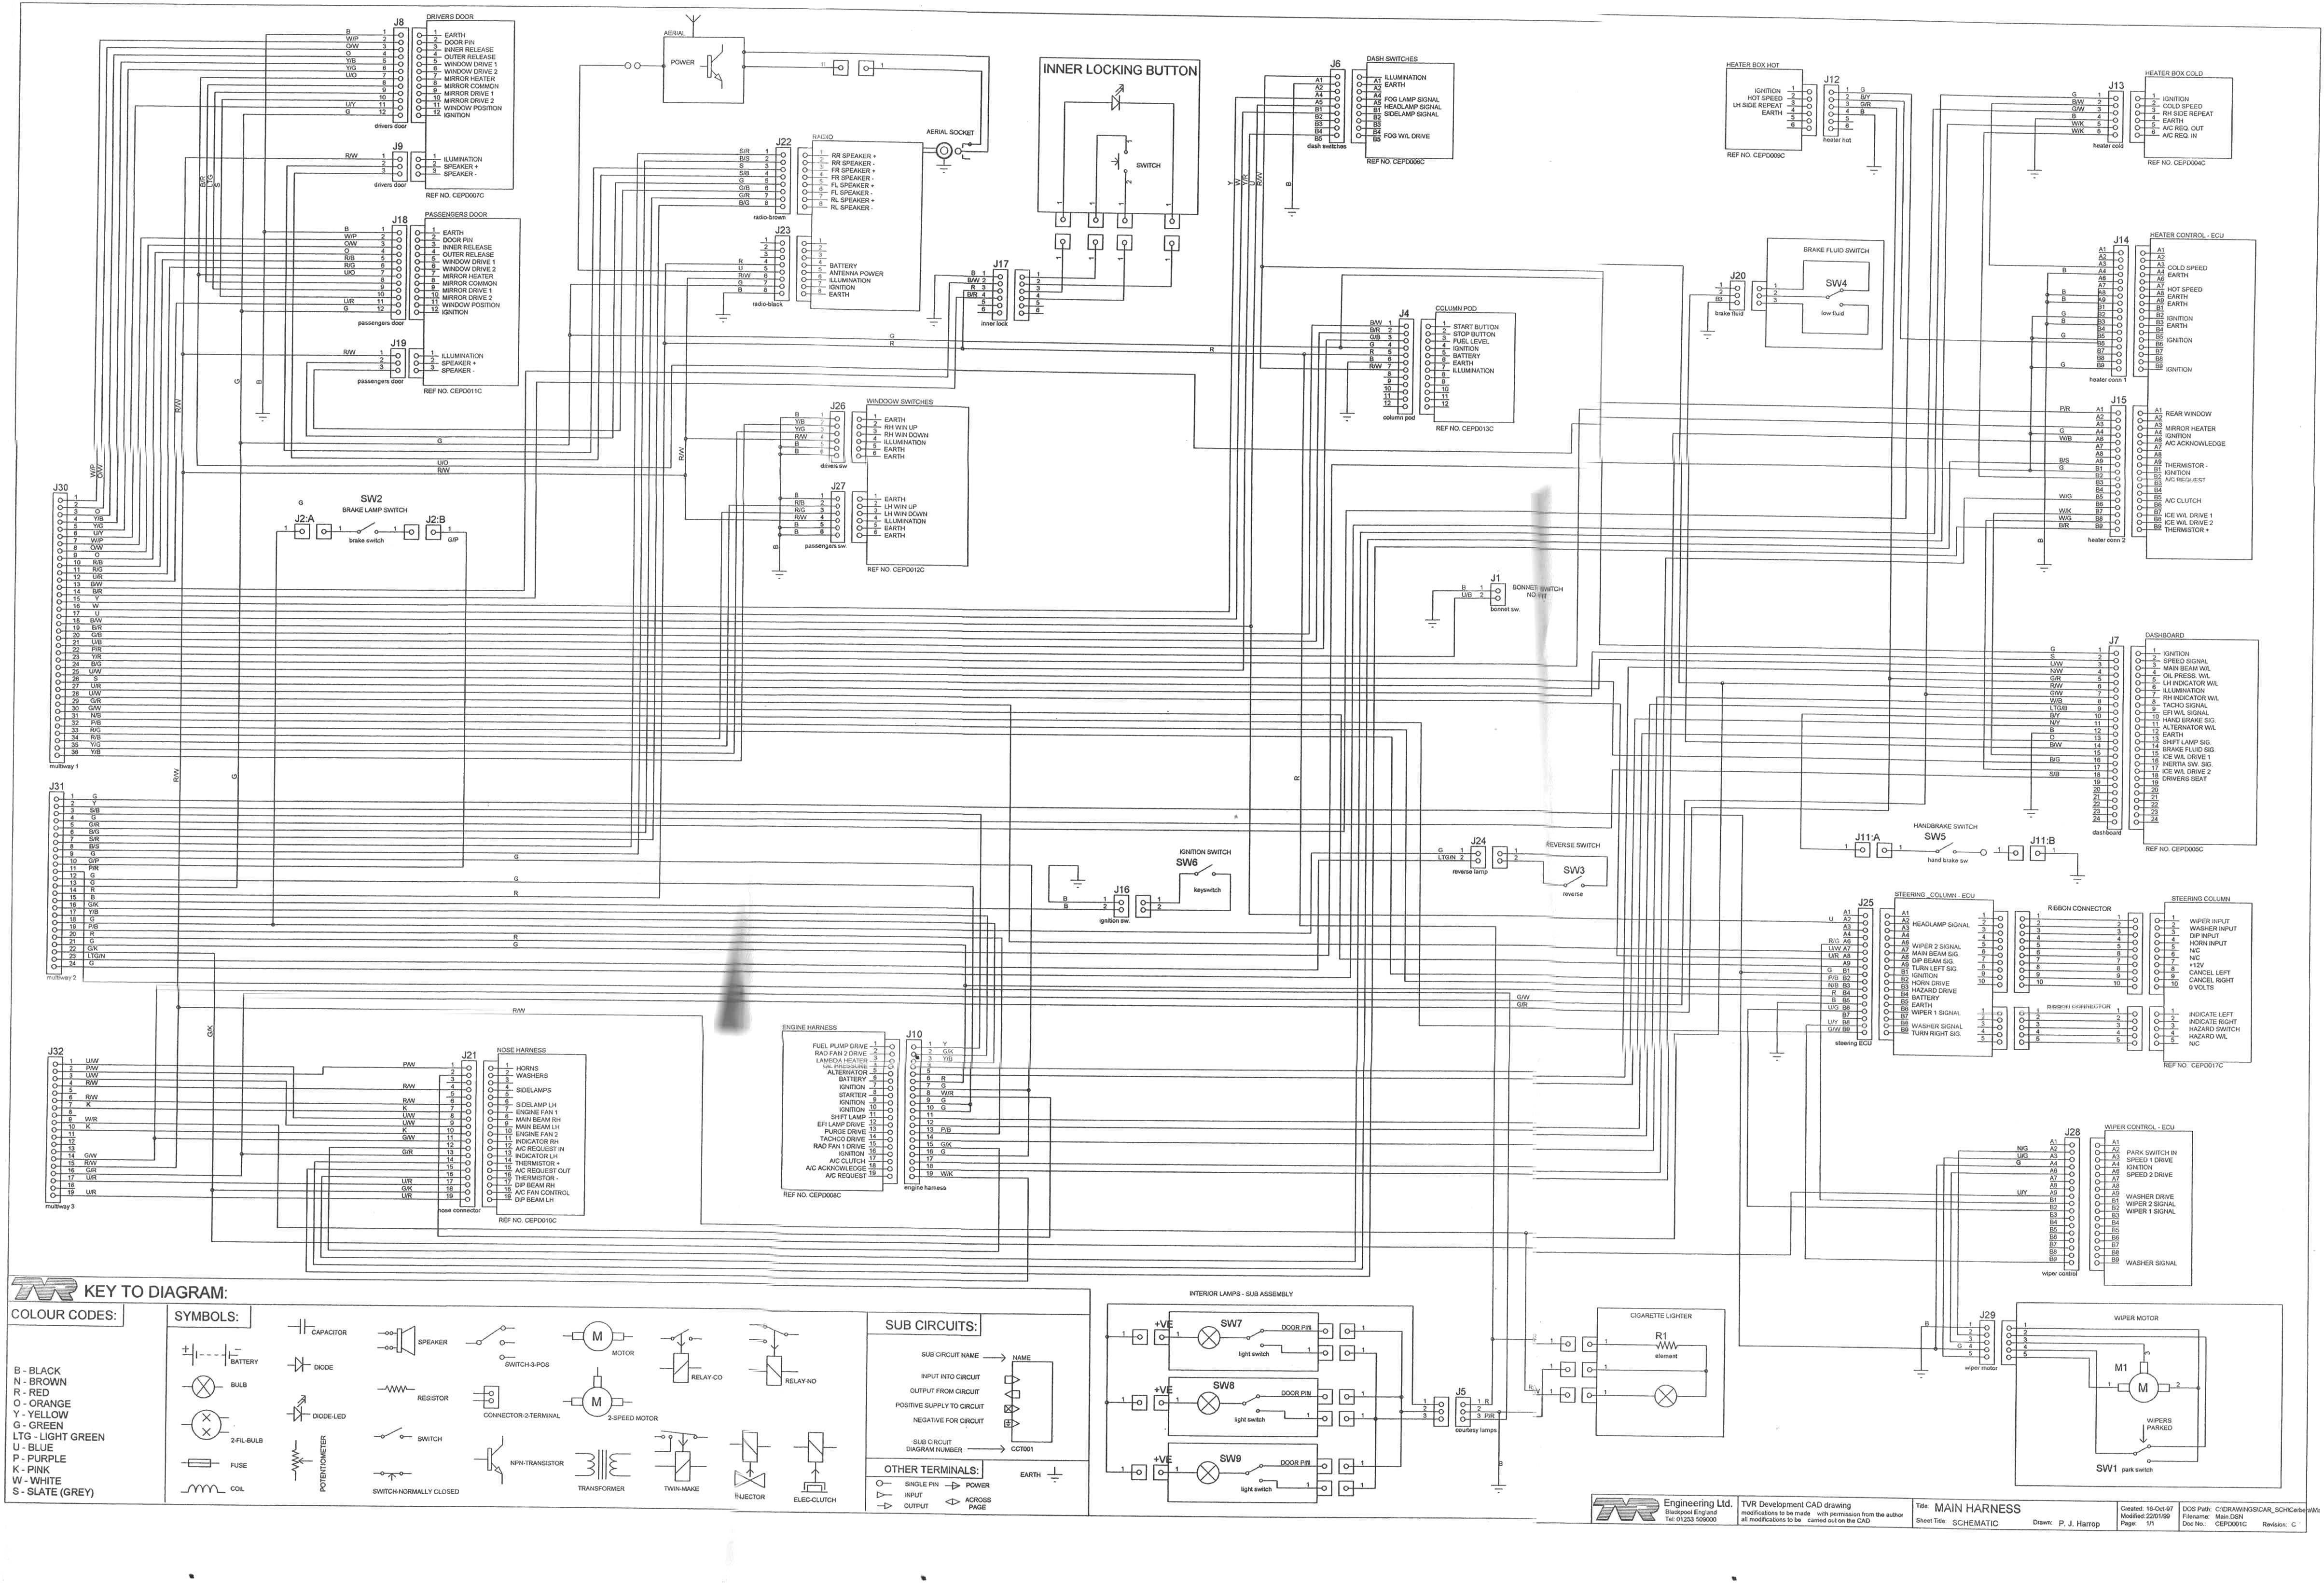 Aprilaire 224 Wiring Diagram | Manual E-Books - Aprilaire Humidifier Wiring Diagram